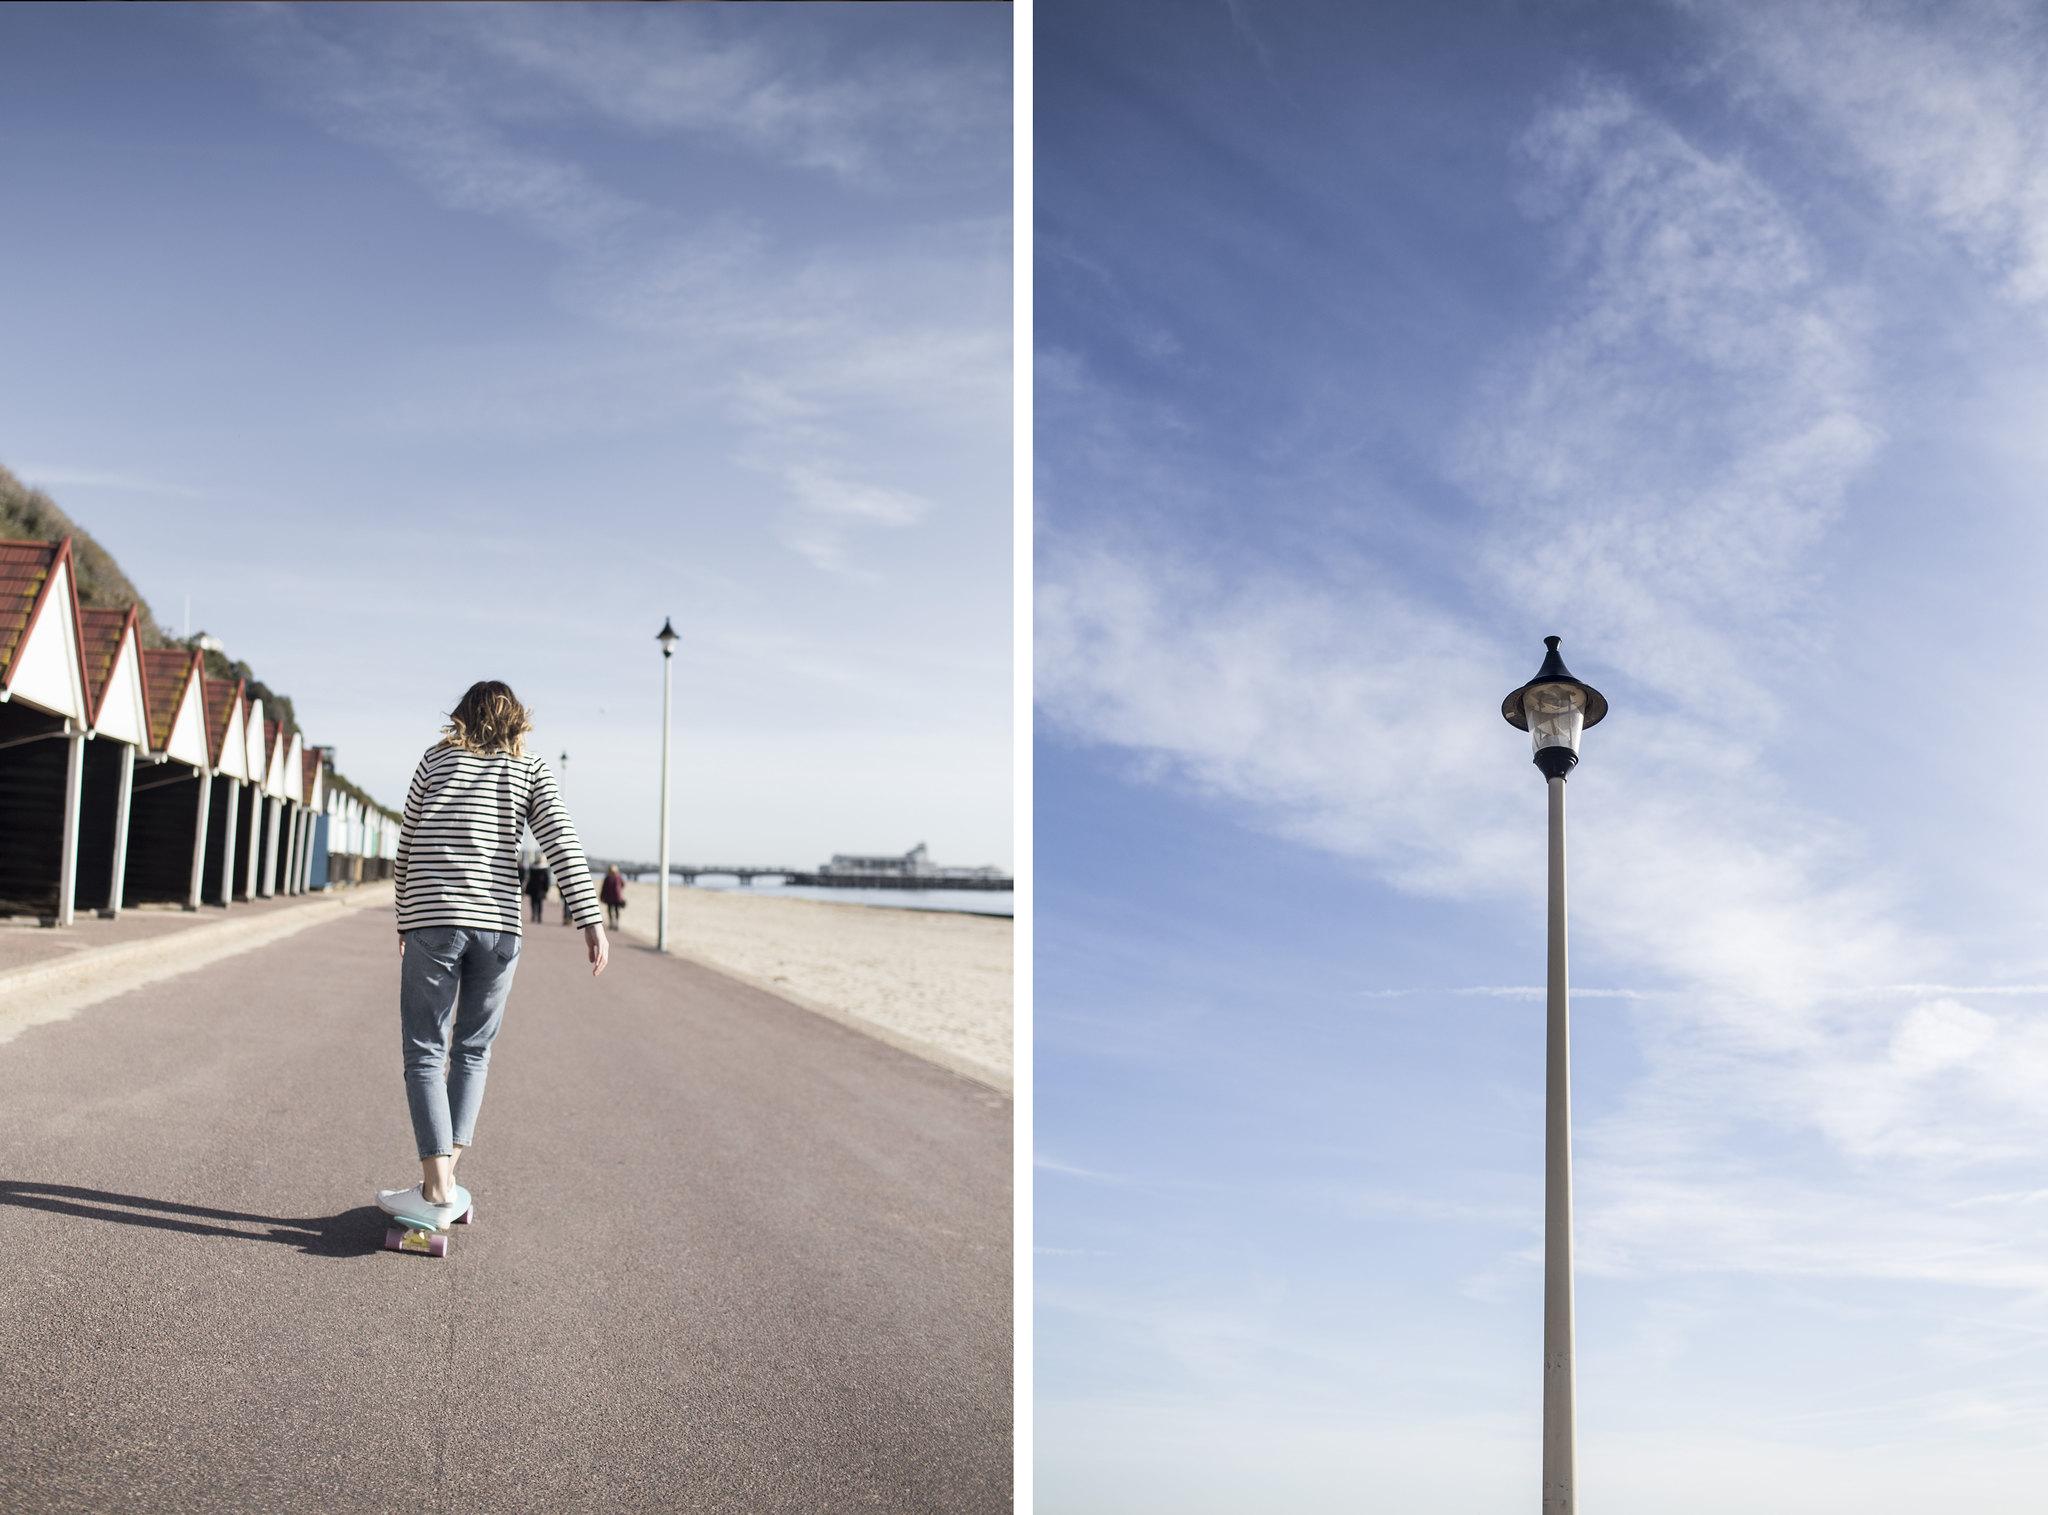 Jordan_Bunker_penny_skateboards_14